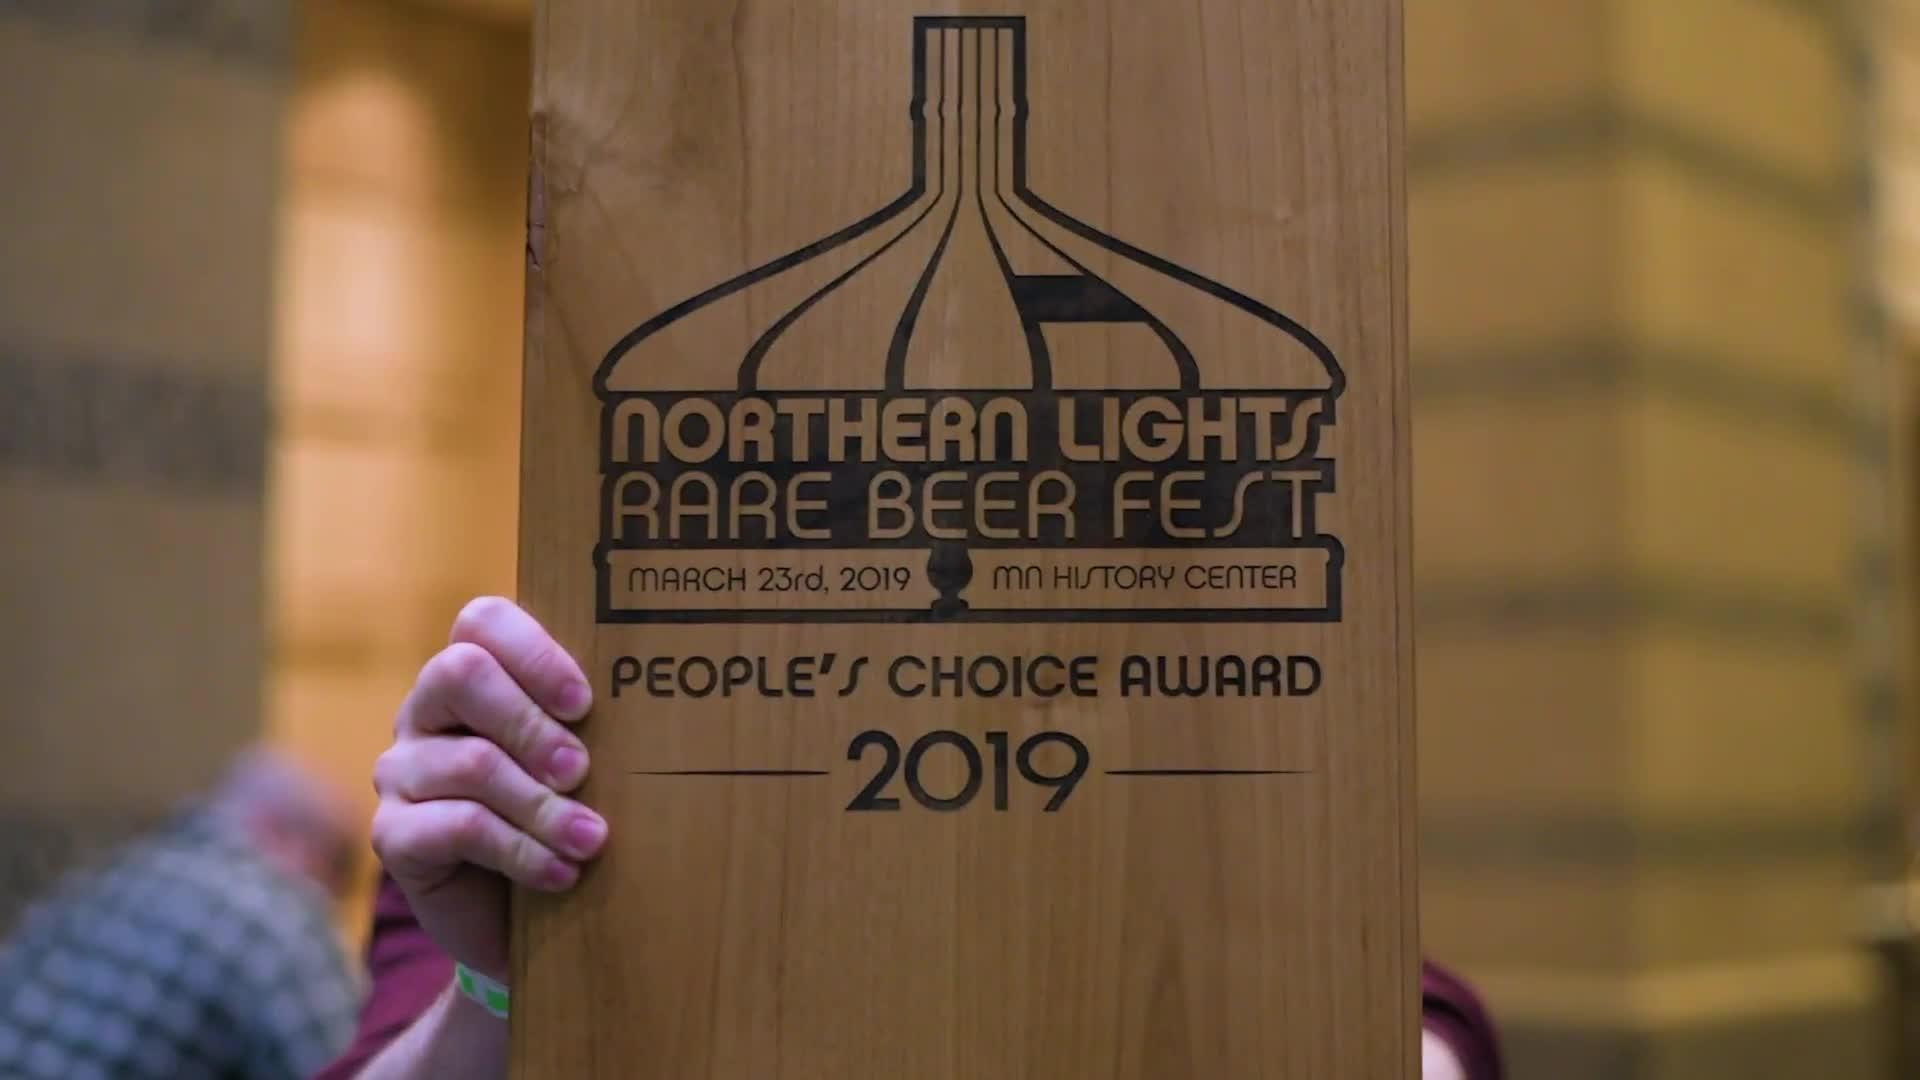 Northern Lights Rare Beer Festival